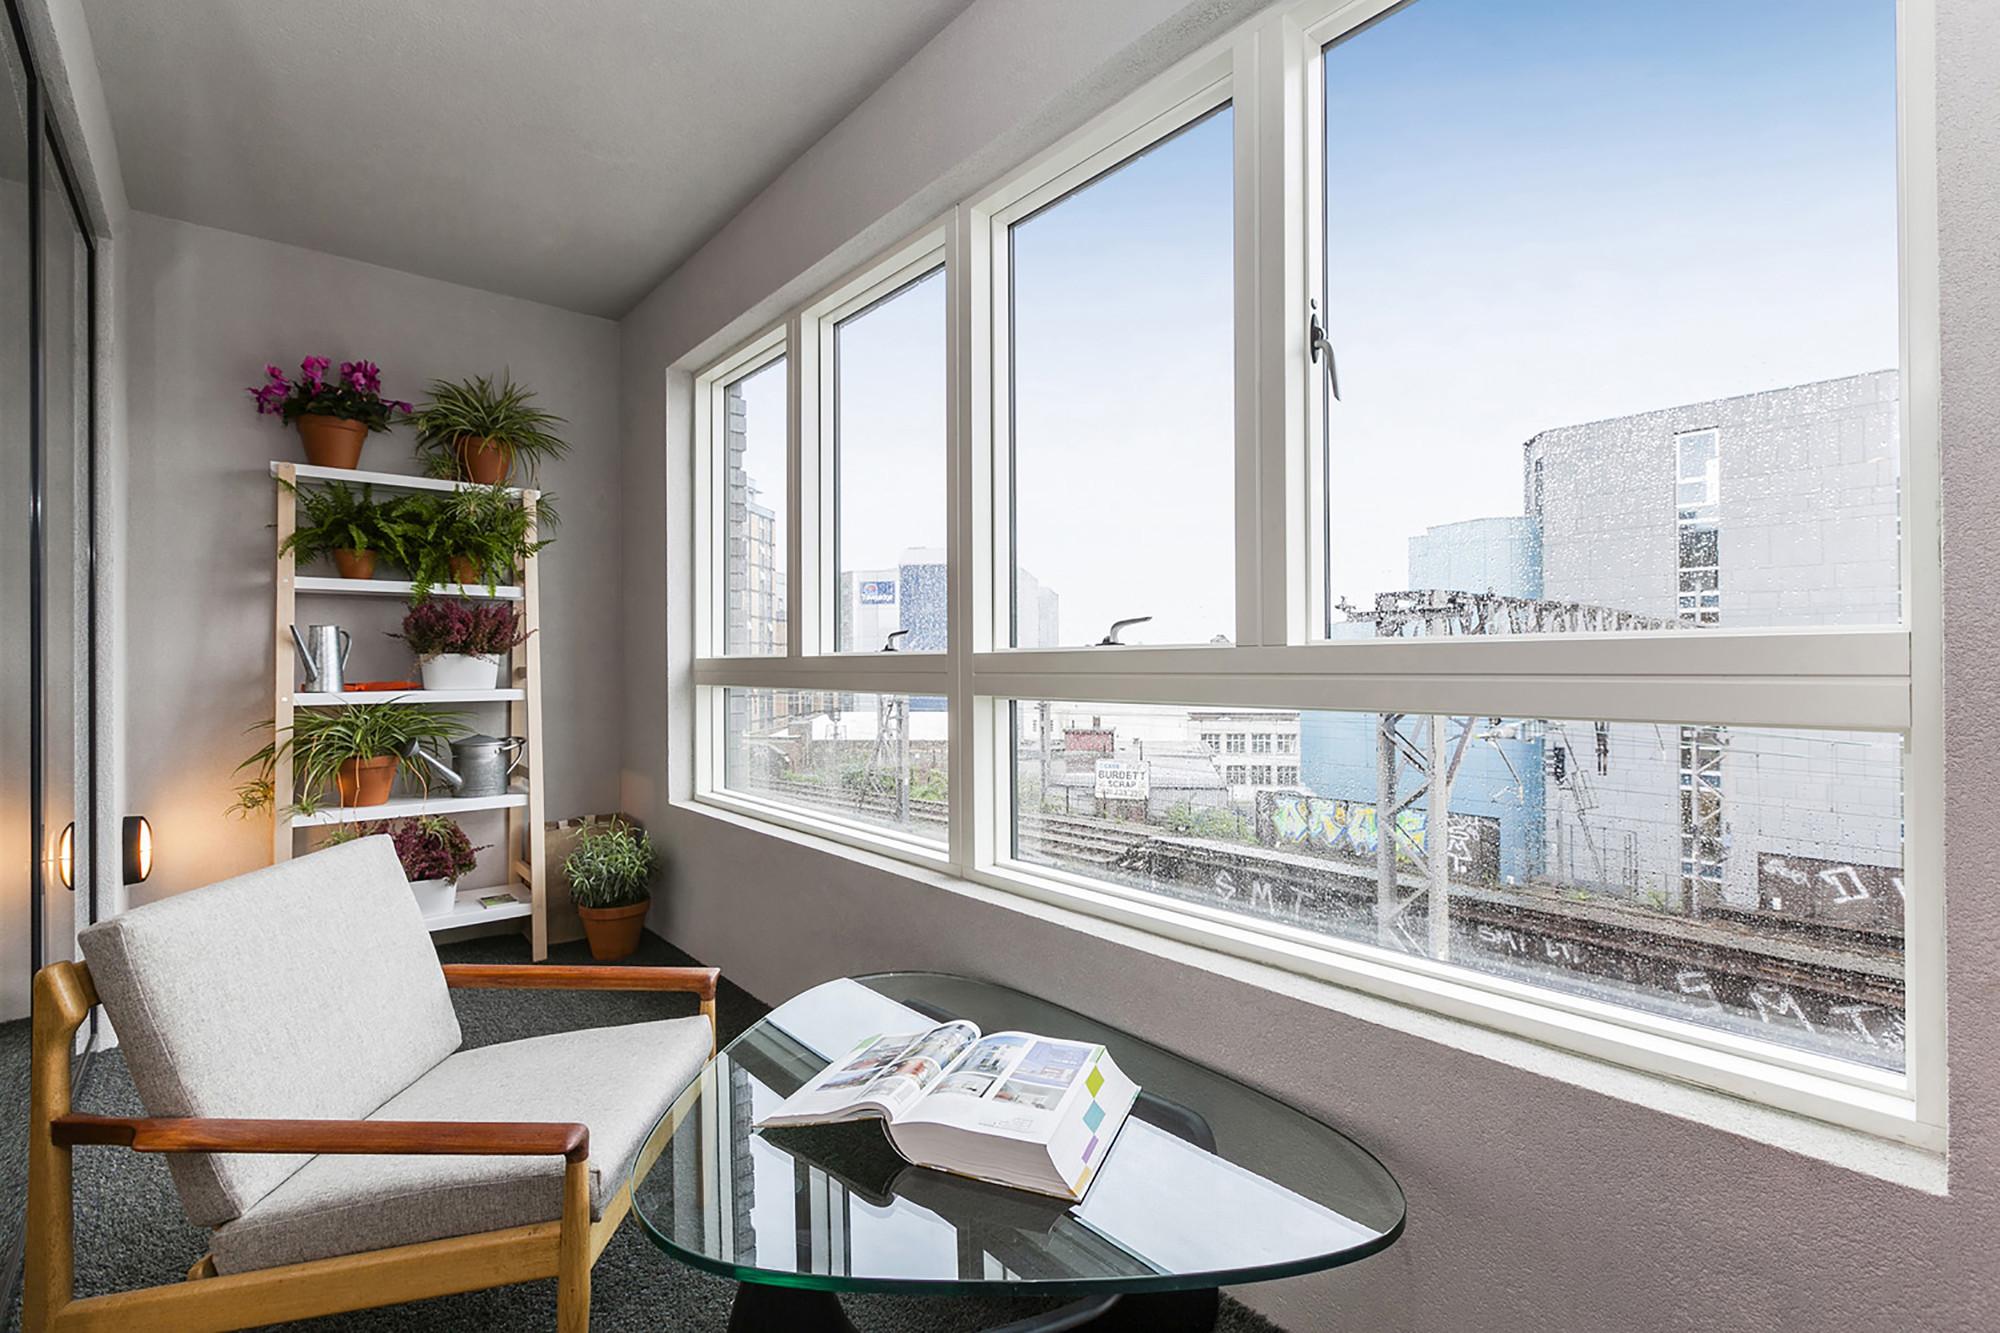 gallery of mint street peabody housing pitman tozer architects 3